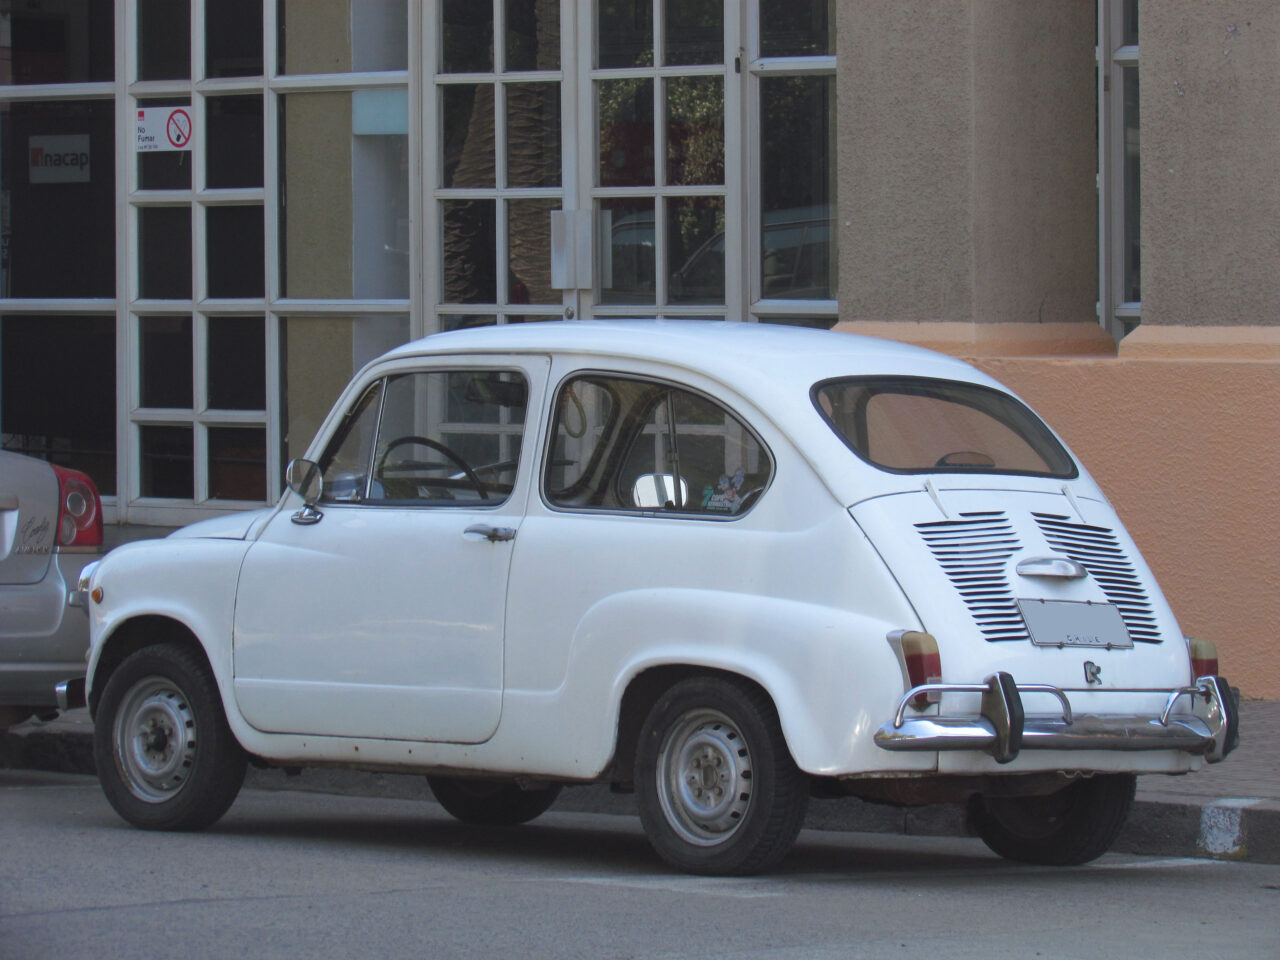 Fiat_600_1972_9683934274-1280x960.jpg